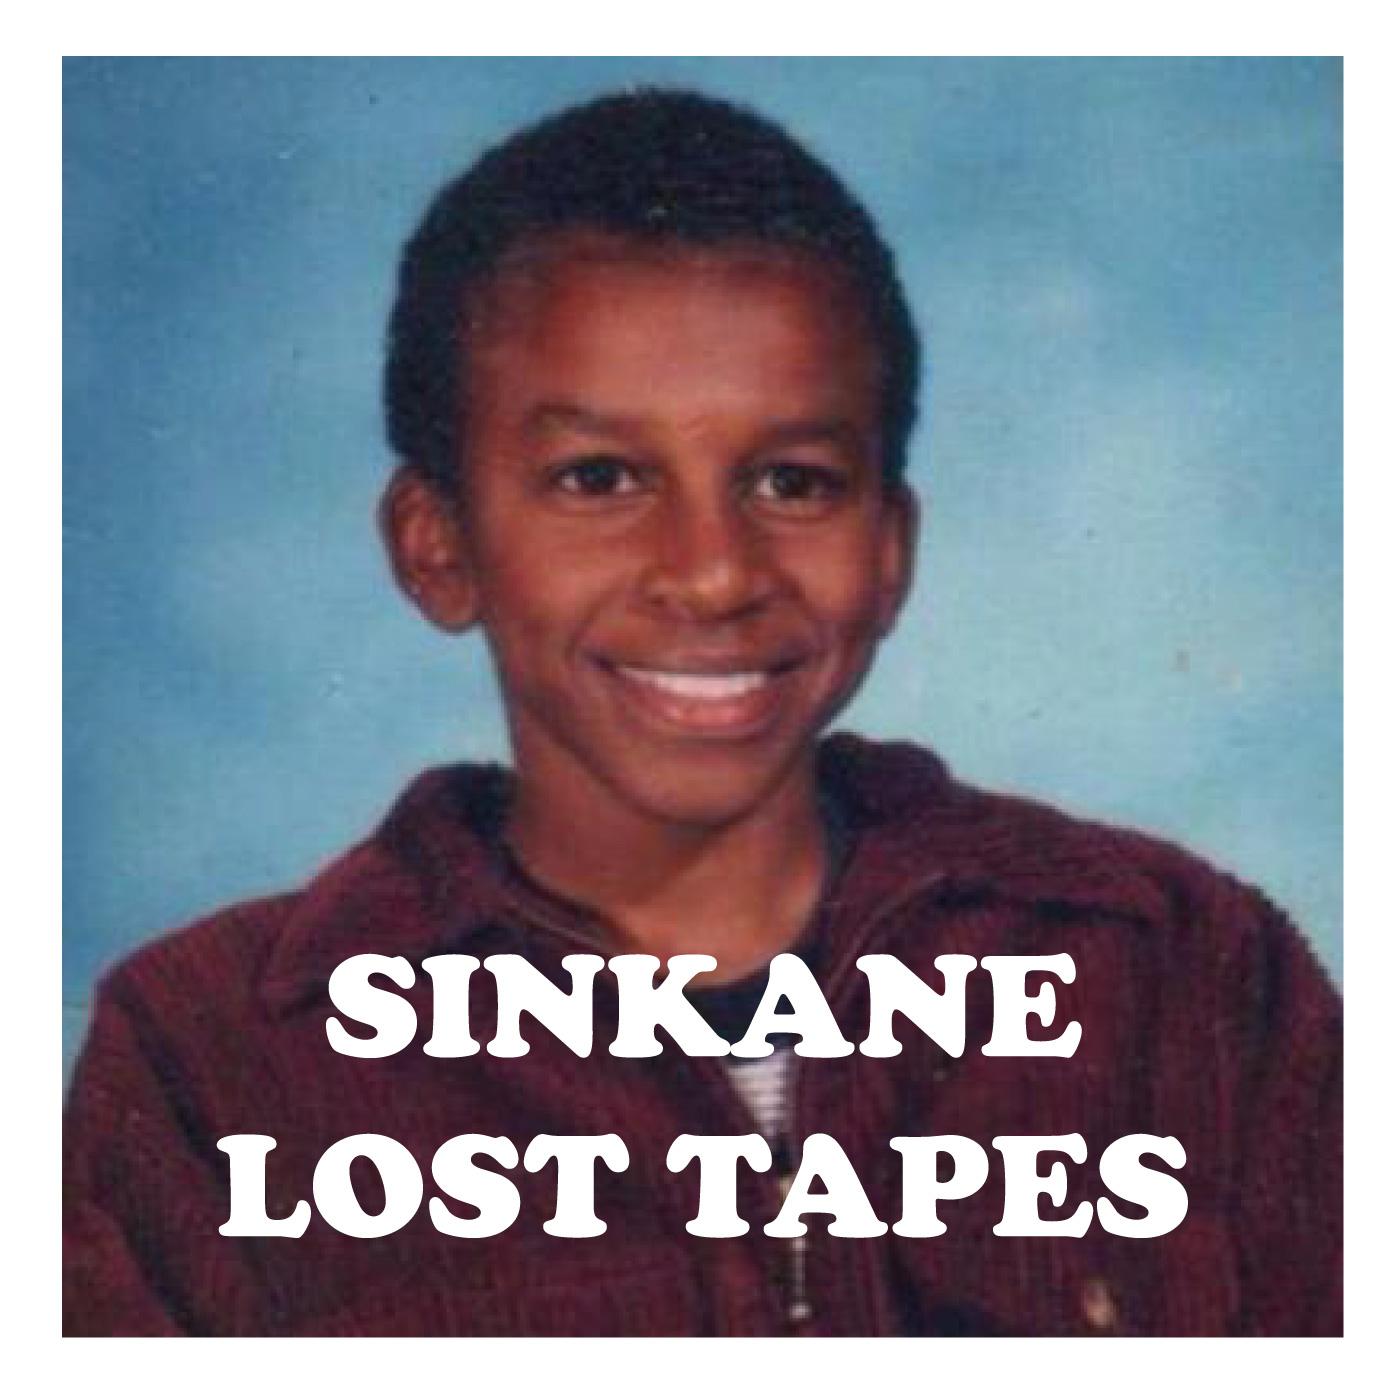 SInkane lost tapes rarities collection album stream artwork